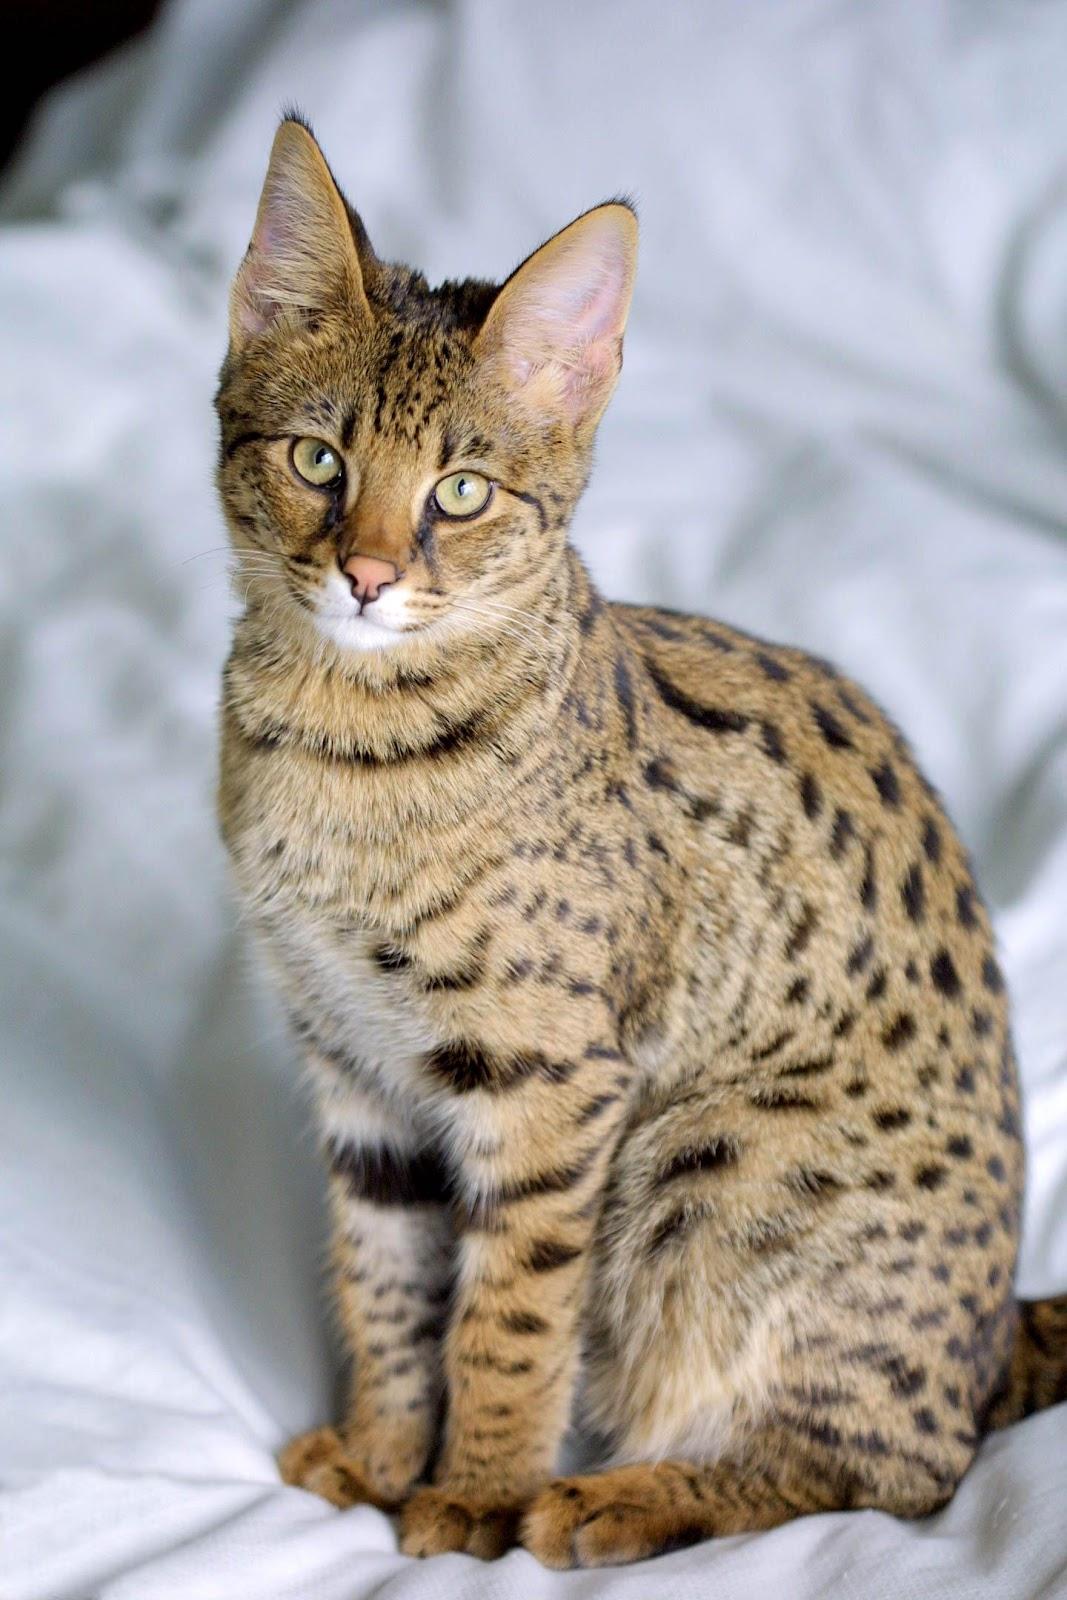 http://upload.wikimedia.org/wikipedia/commons/c/c4/Savannah_Cat_portrait.jpg